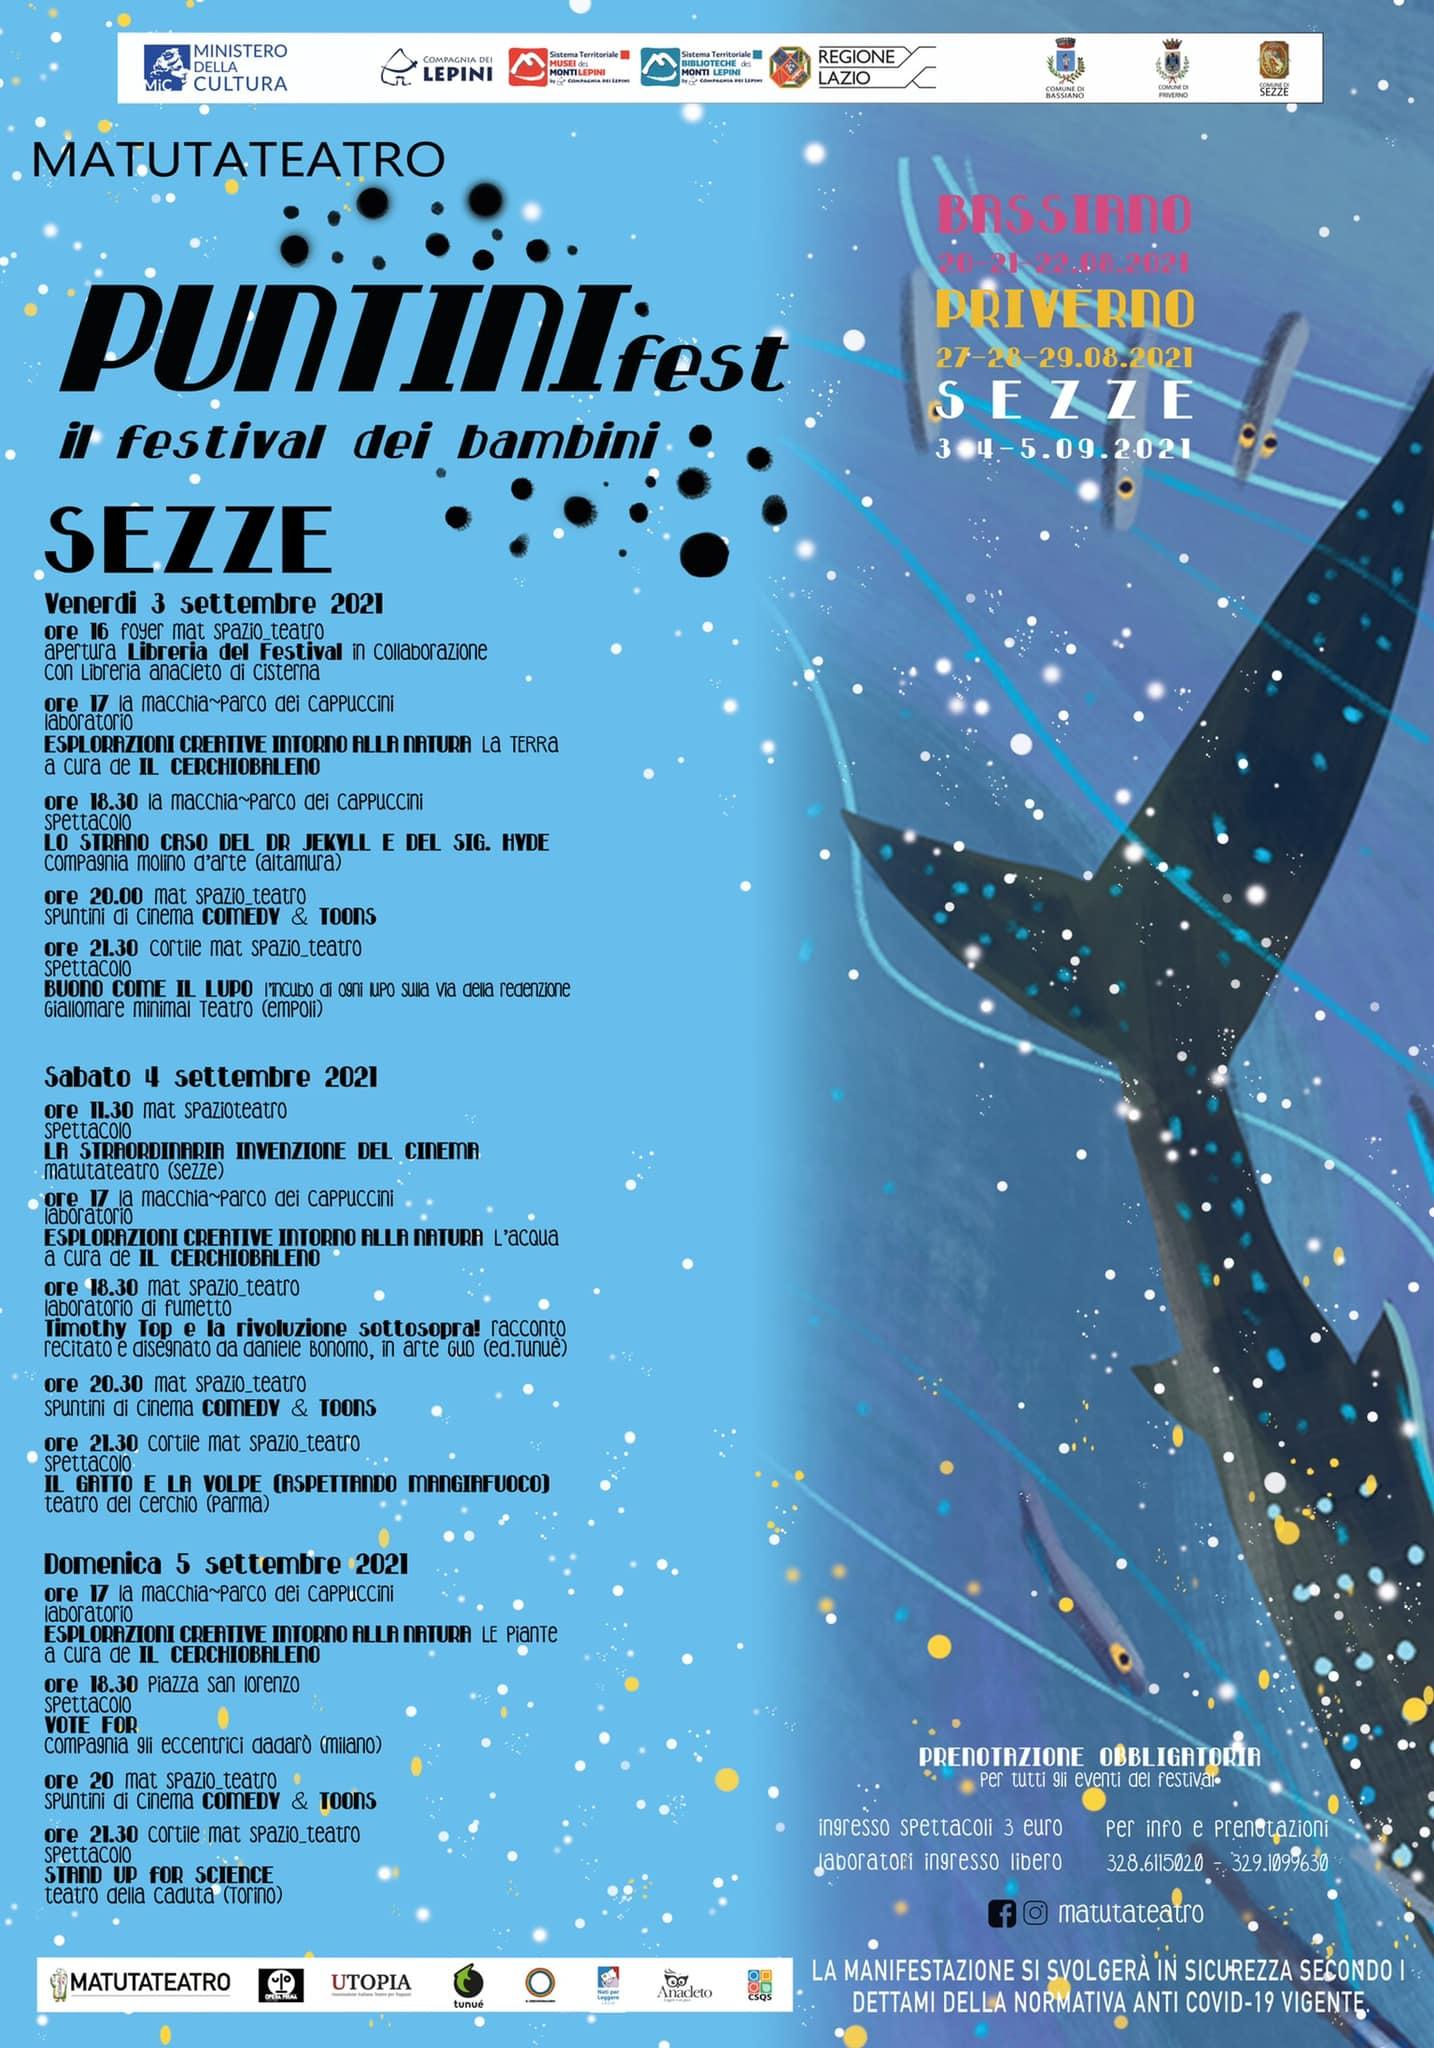 putinifestival-sezze